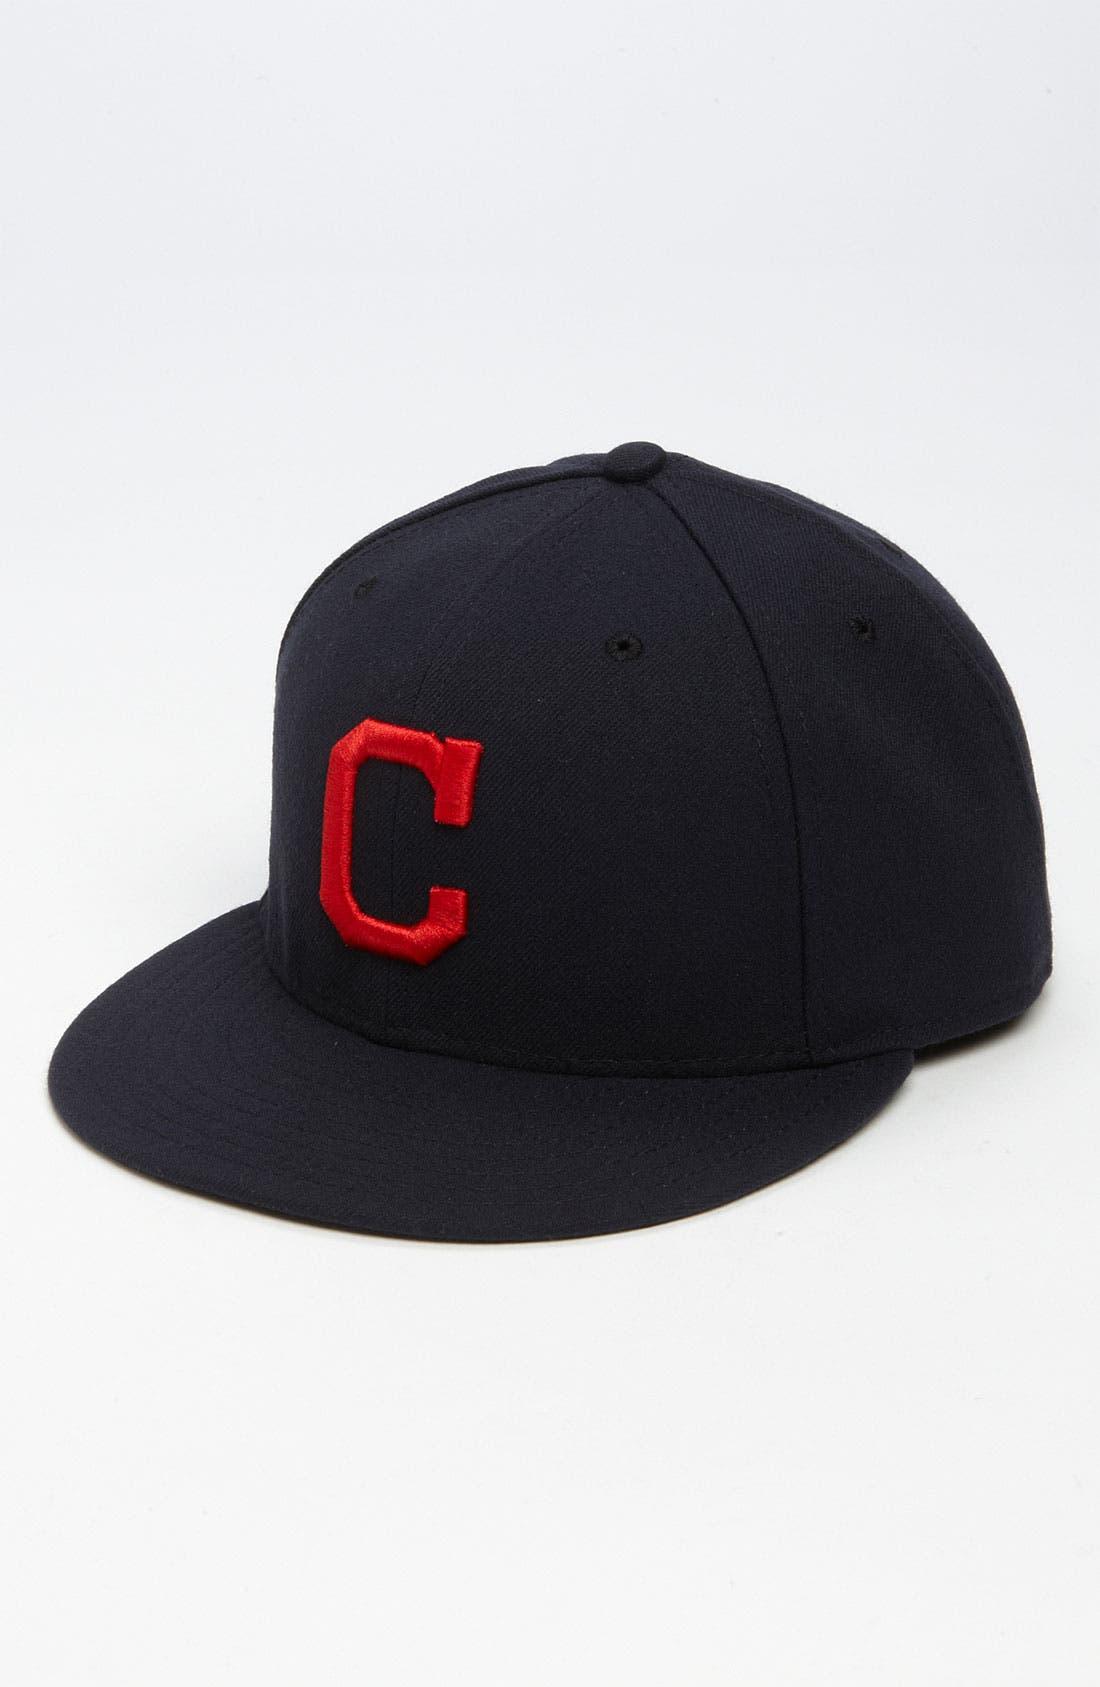 Alternate Image 1 Selected - New Era Cap 'Cleveland Indians' Baseball Cap